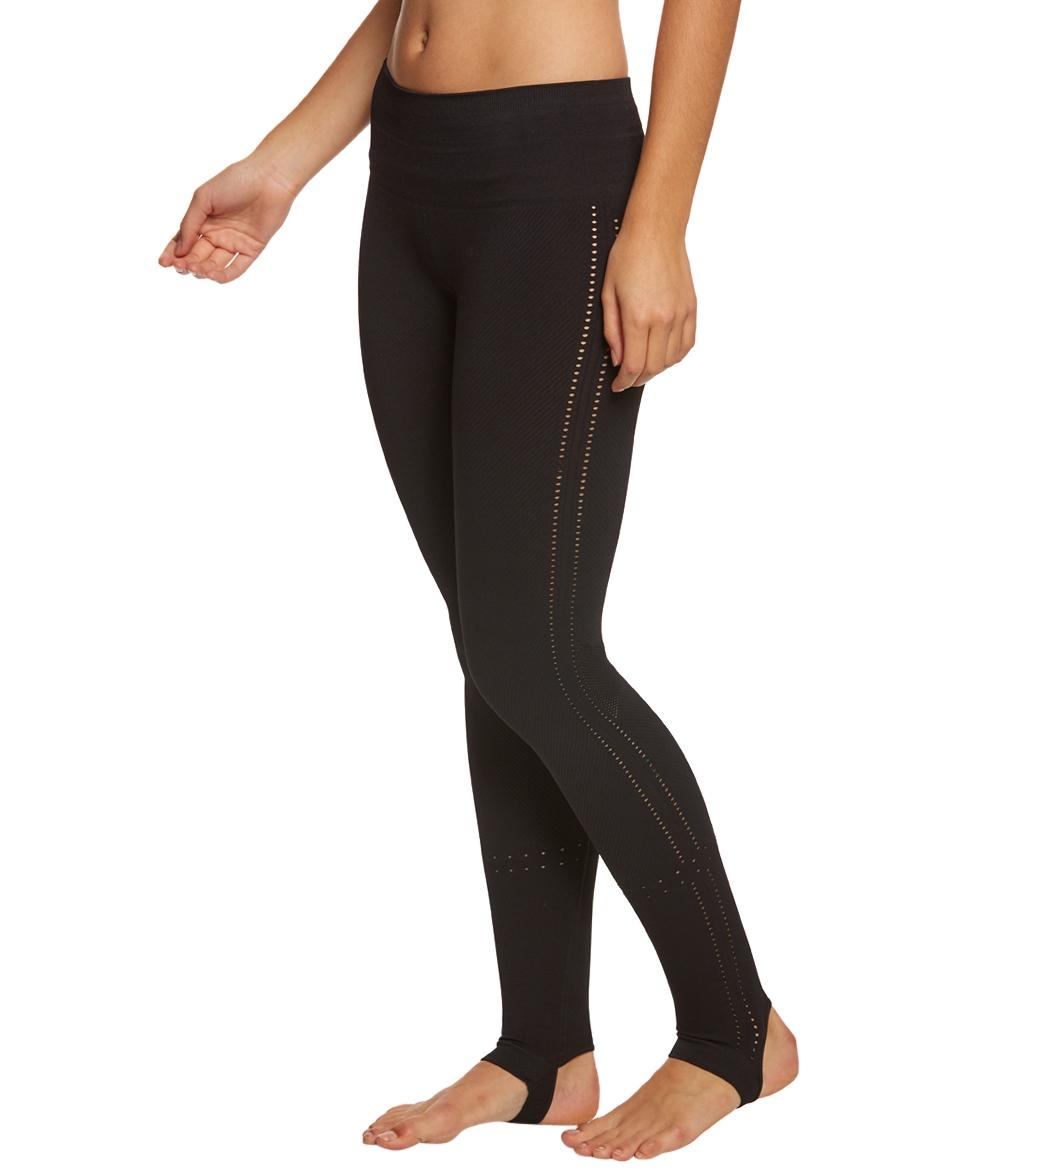 8e672ca5f9987 Free People Movement Method Yoga Leggings at YogaOutlet.com - Free ...